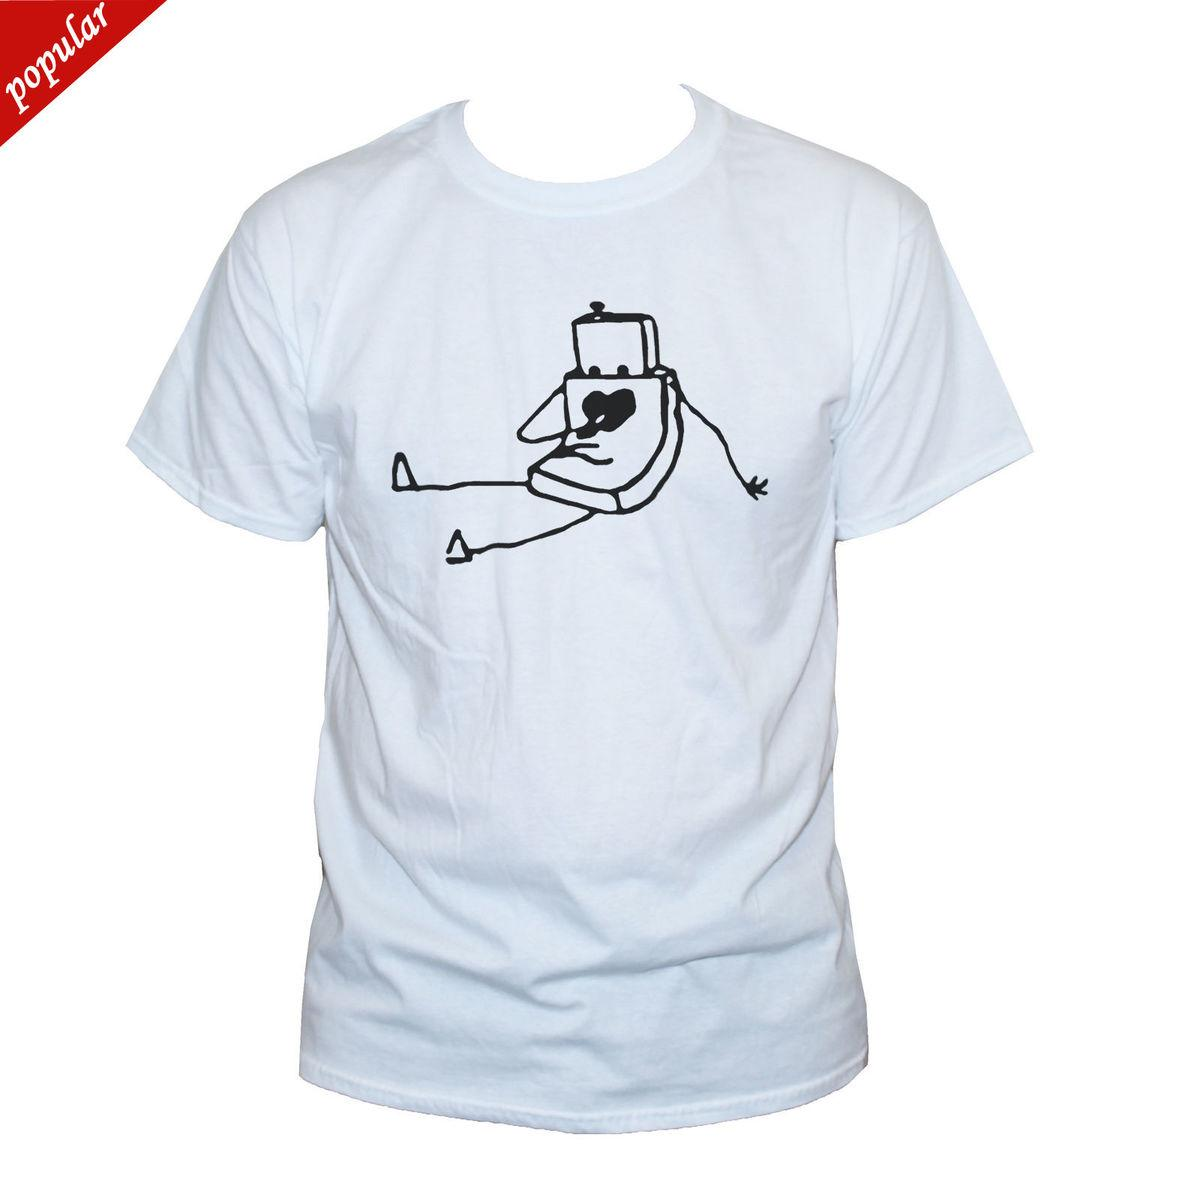 b8f432e25 Robot T Shirt Cute Funny Graphic Printed Retro Tee Mens/Womens S M L XL XXL  Funny Printed T Shirts Cool Tee From Customteemall, $10.67| DHgate.Com